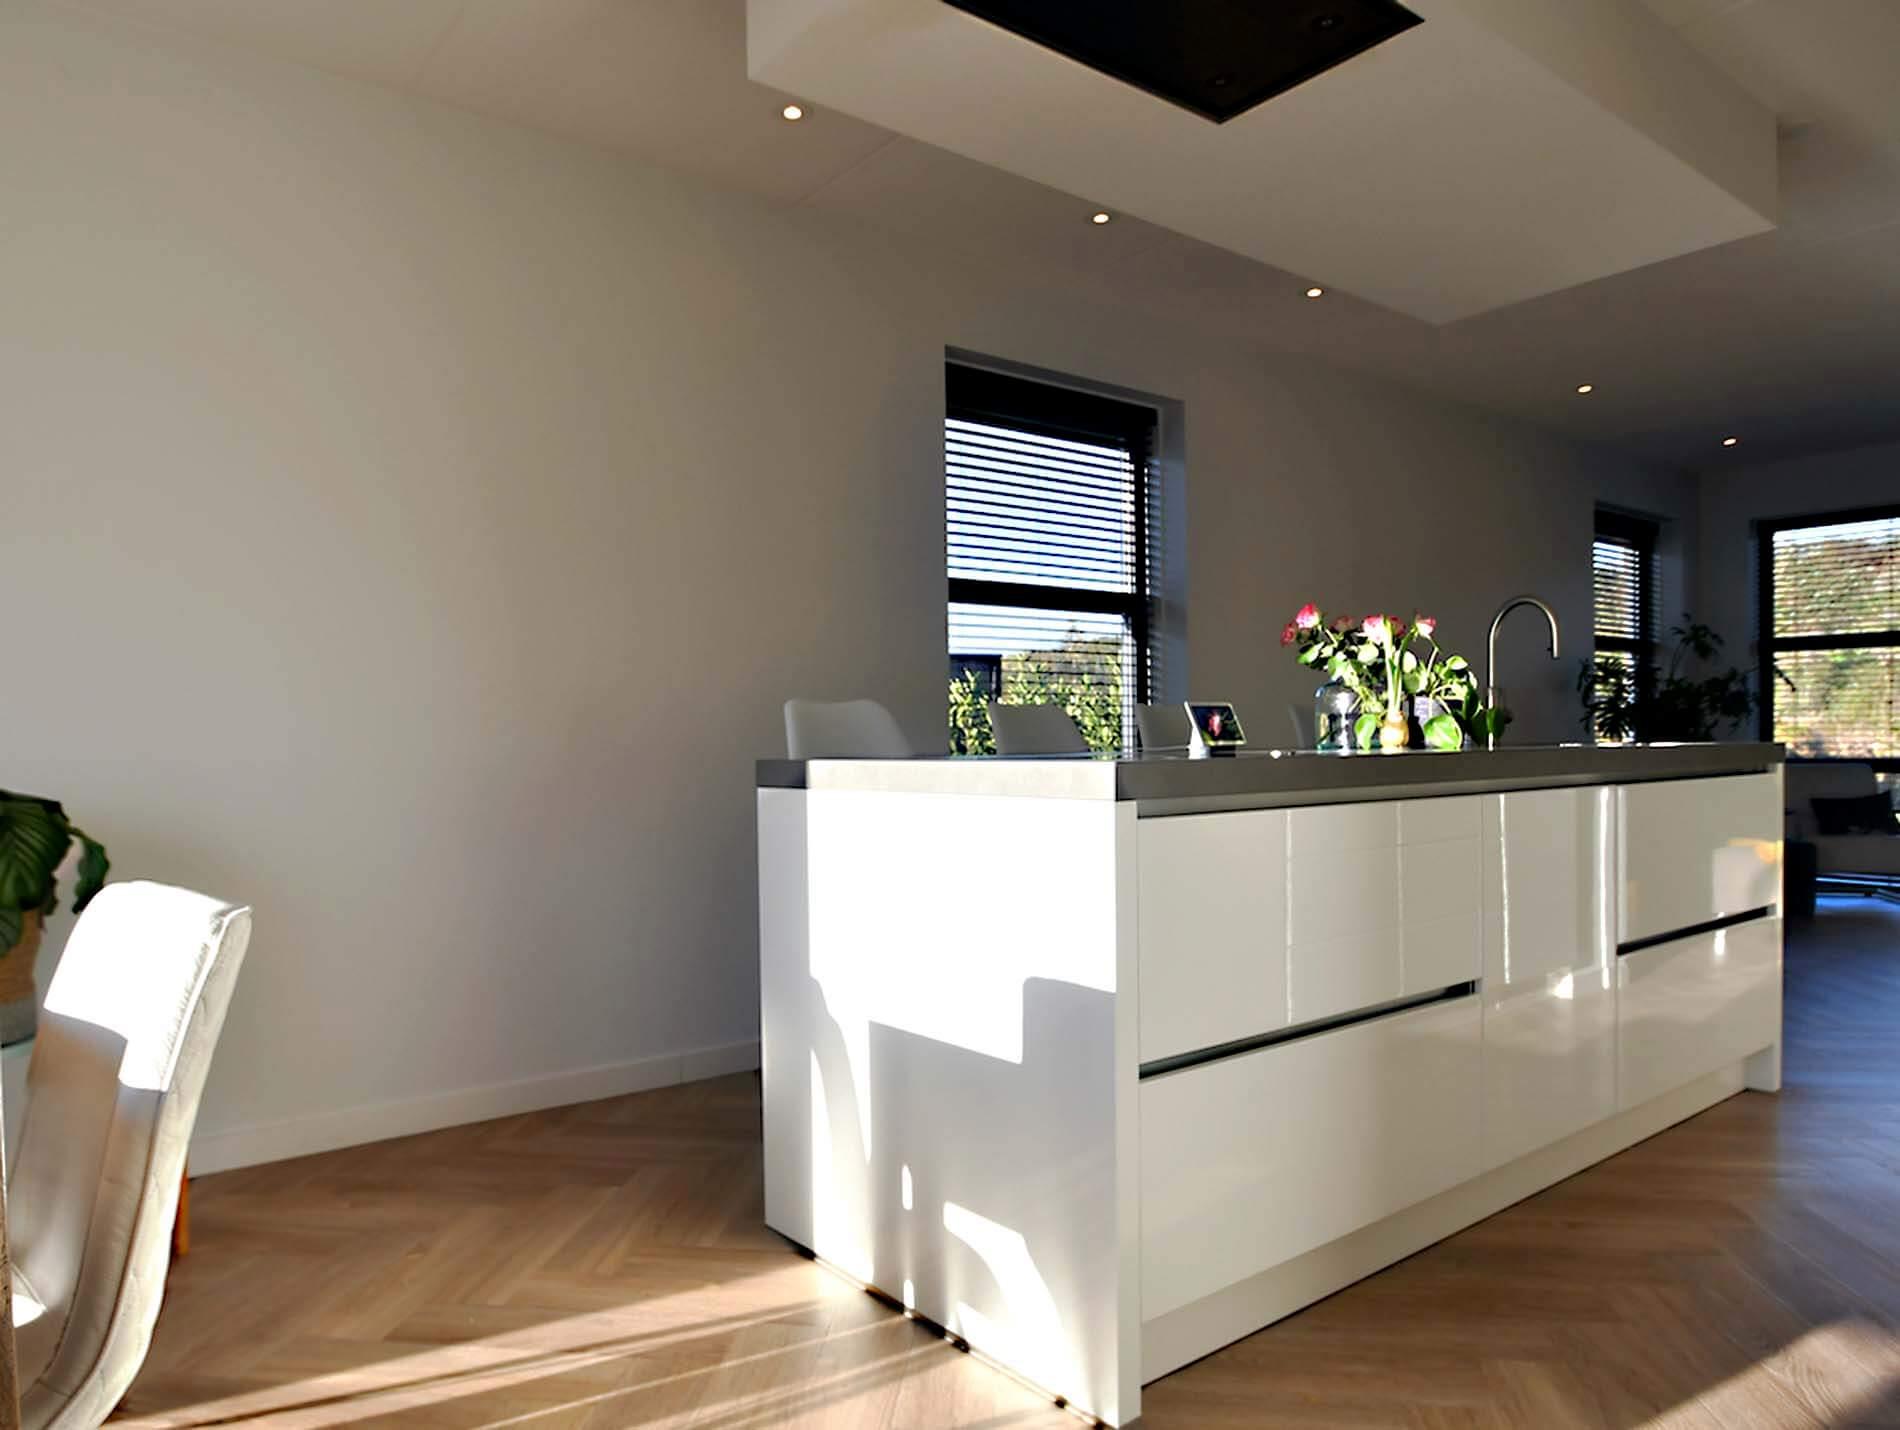 5. Interieur-drachten-nieuwbouw-woning-1900x1430p.jpg